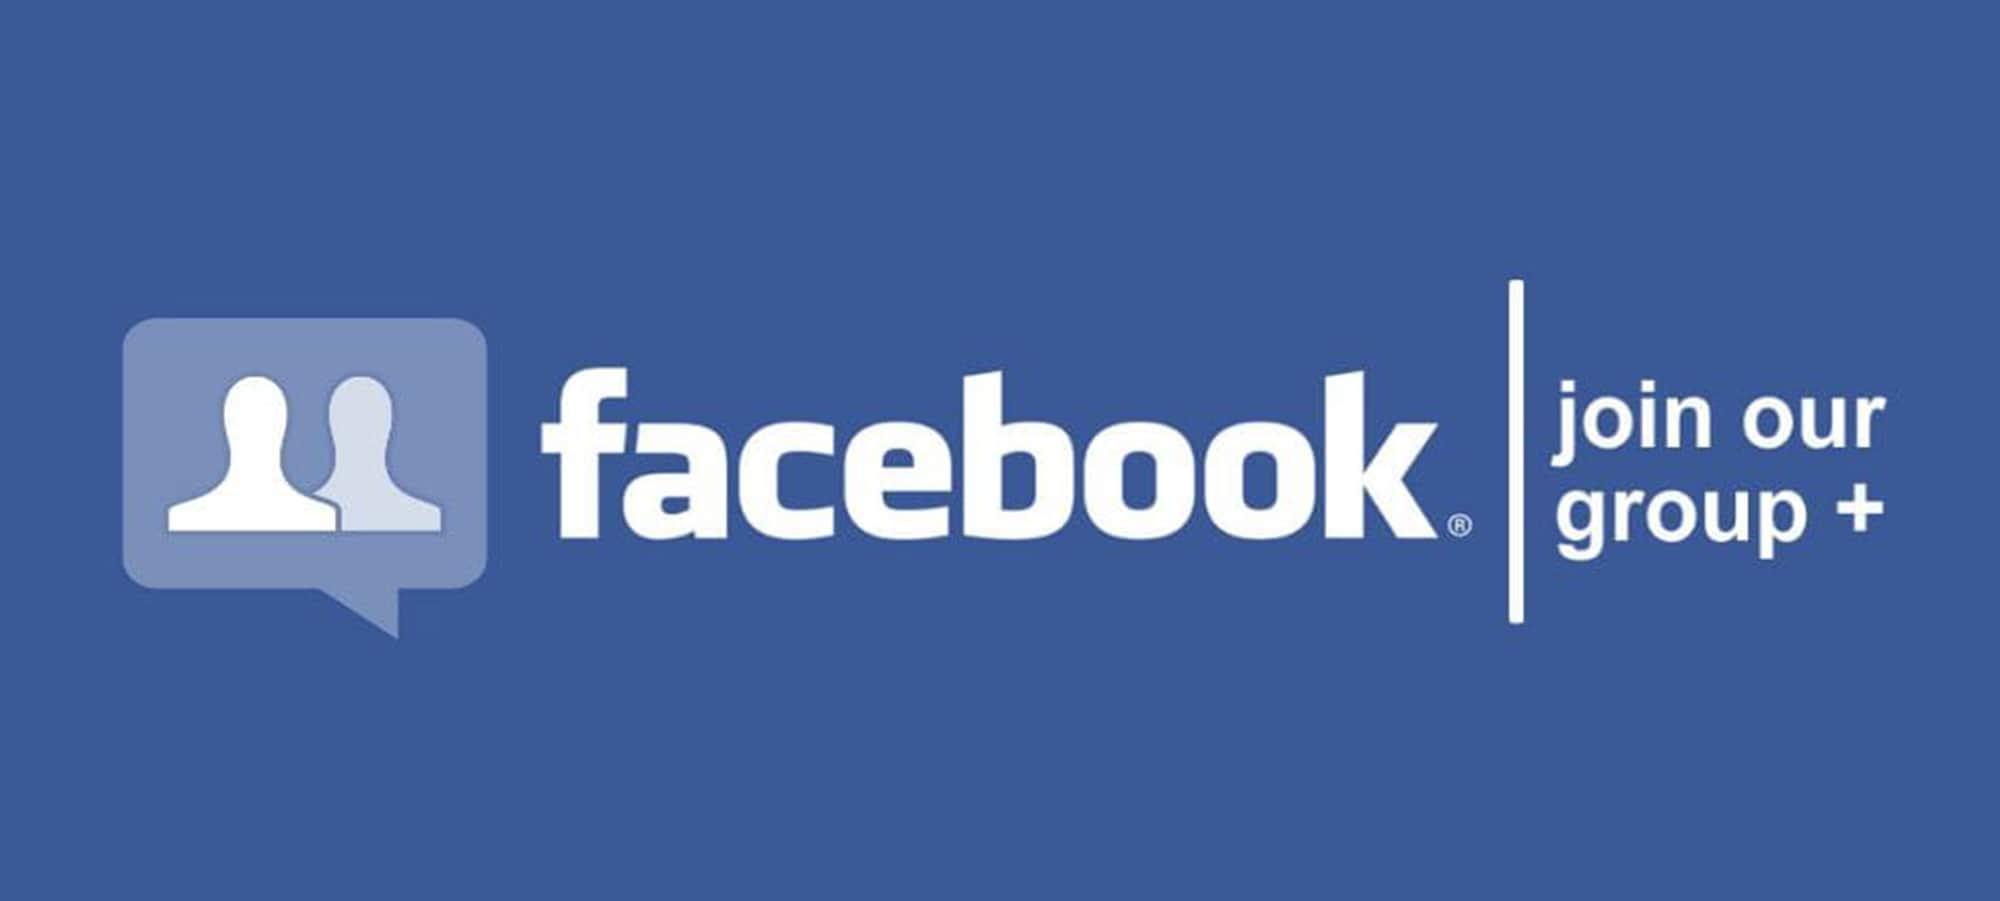 Facebook - Groups